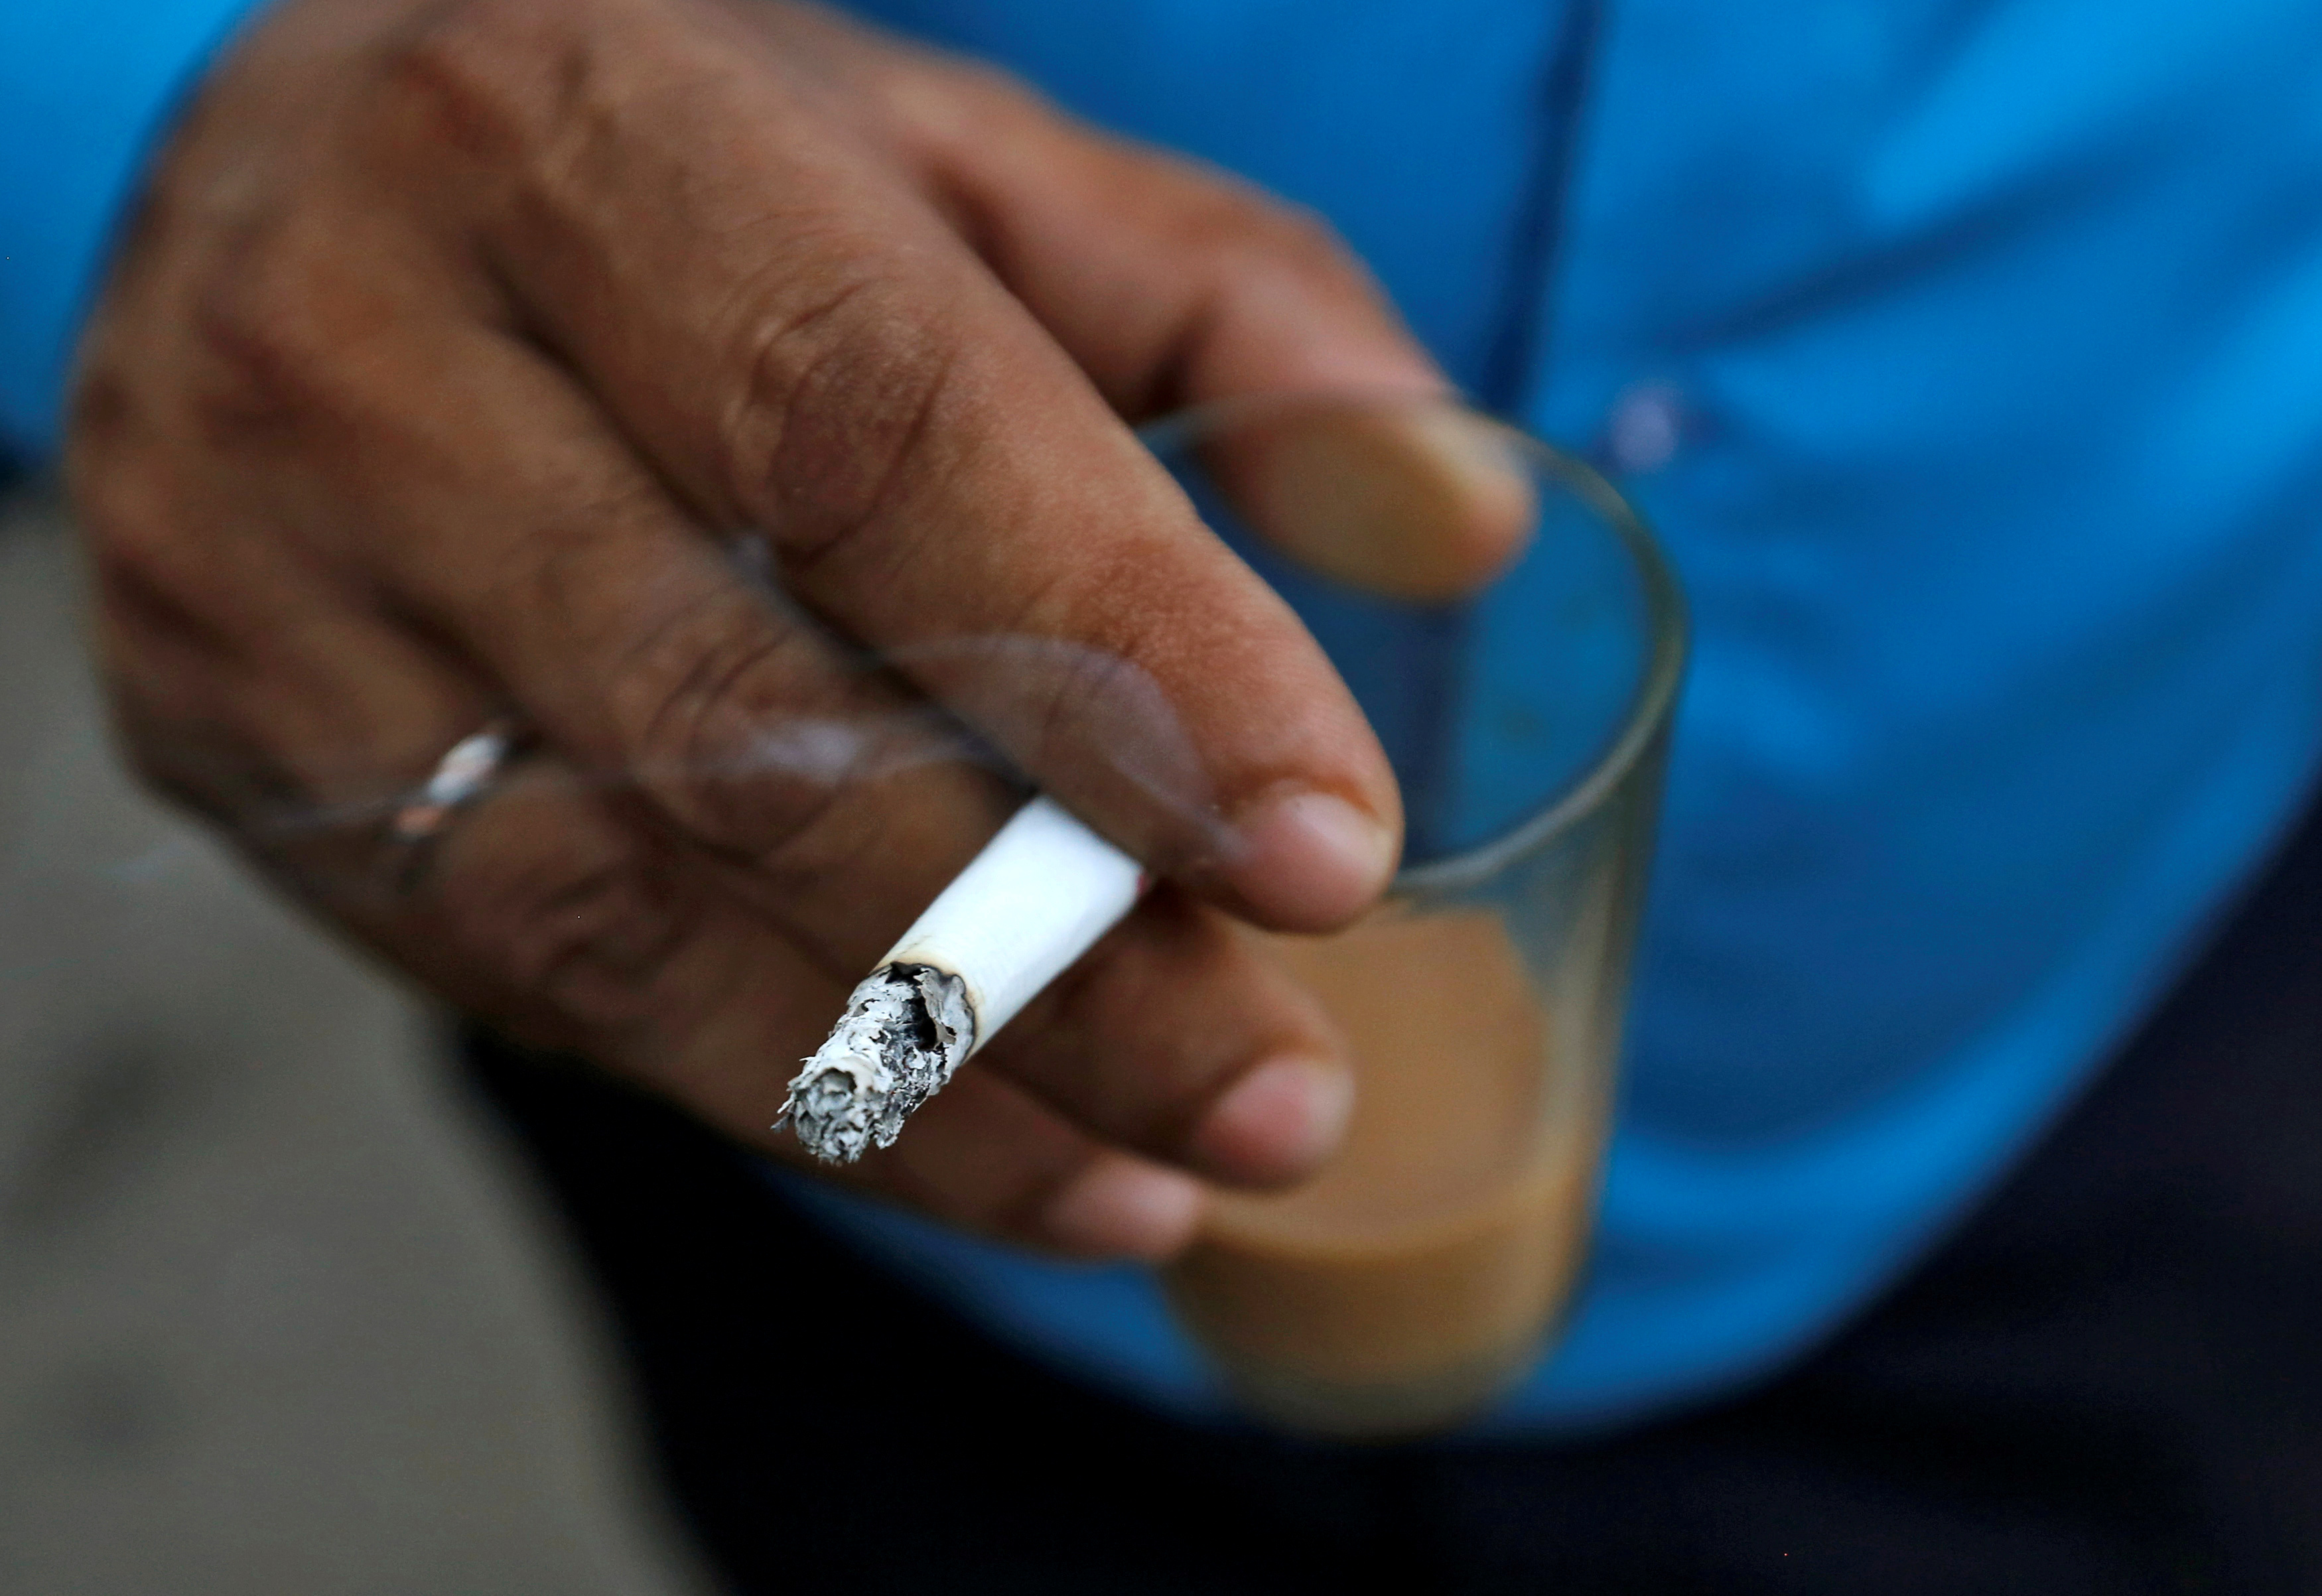 A man smokes a cigarette along a road in Mumbai, India, October 26, 2016. REUTERS/Danish Siddiqui